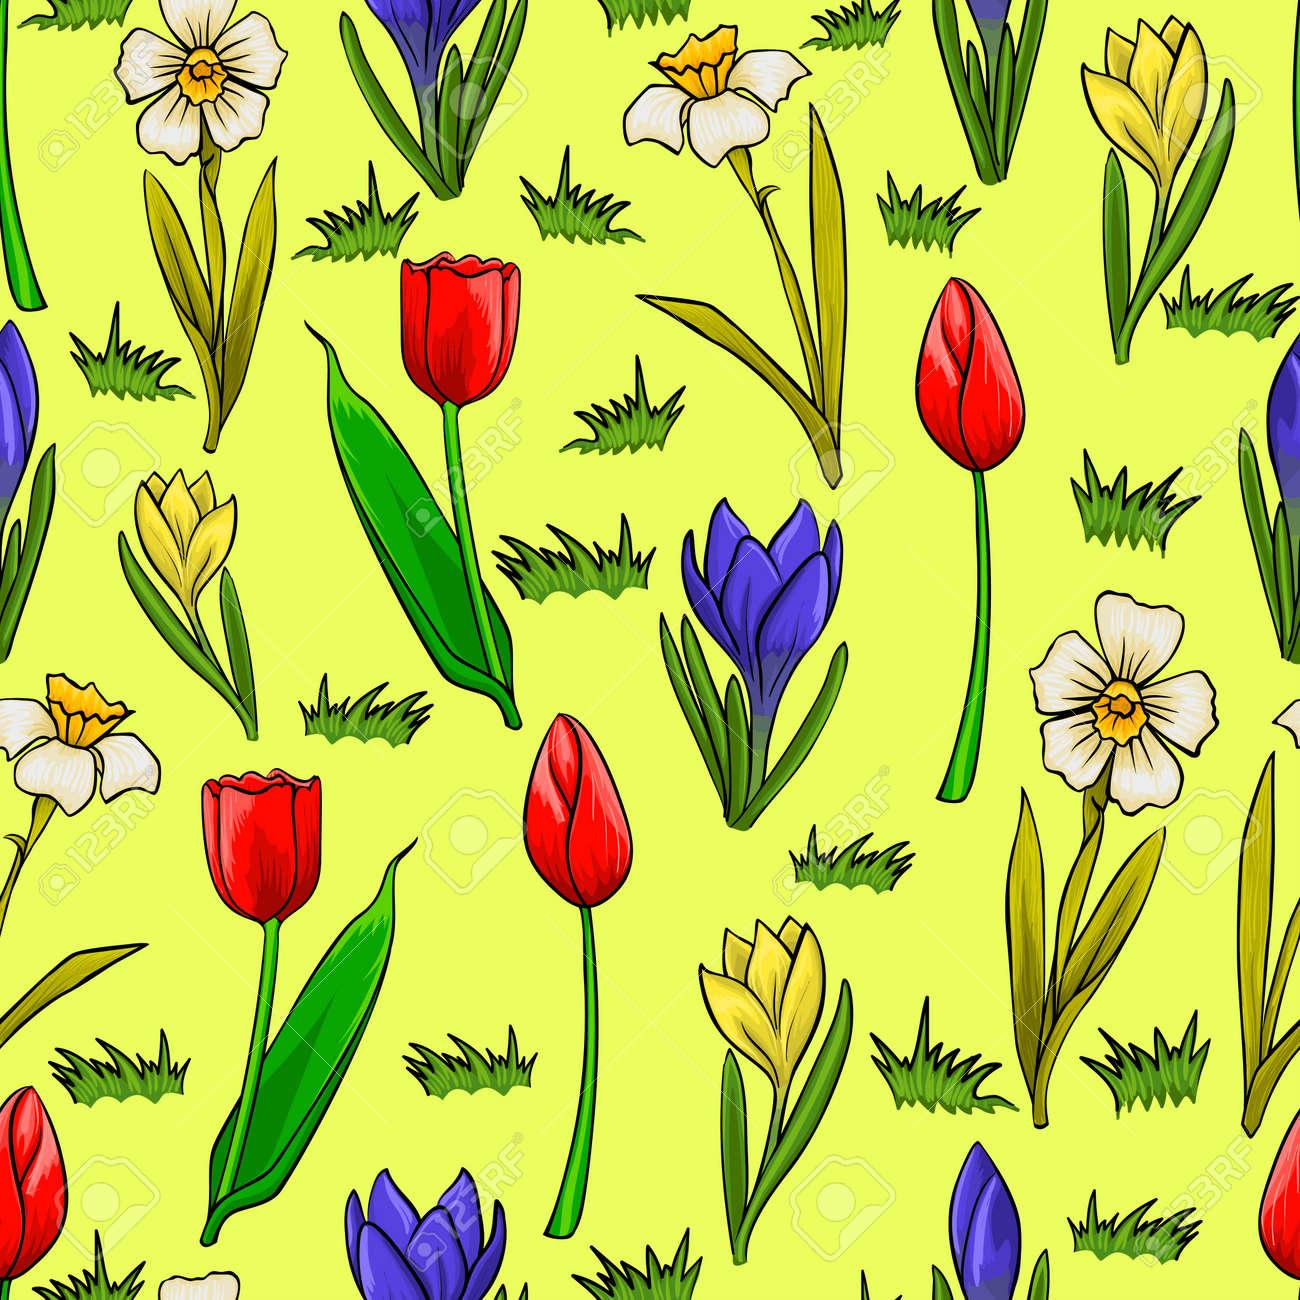 Vector De Dibujos Animados Patron Transparente Con Flores De